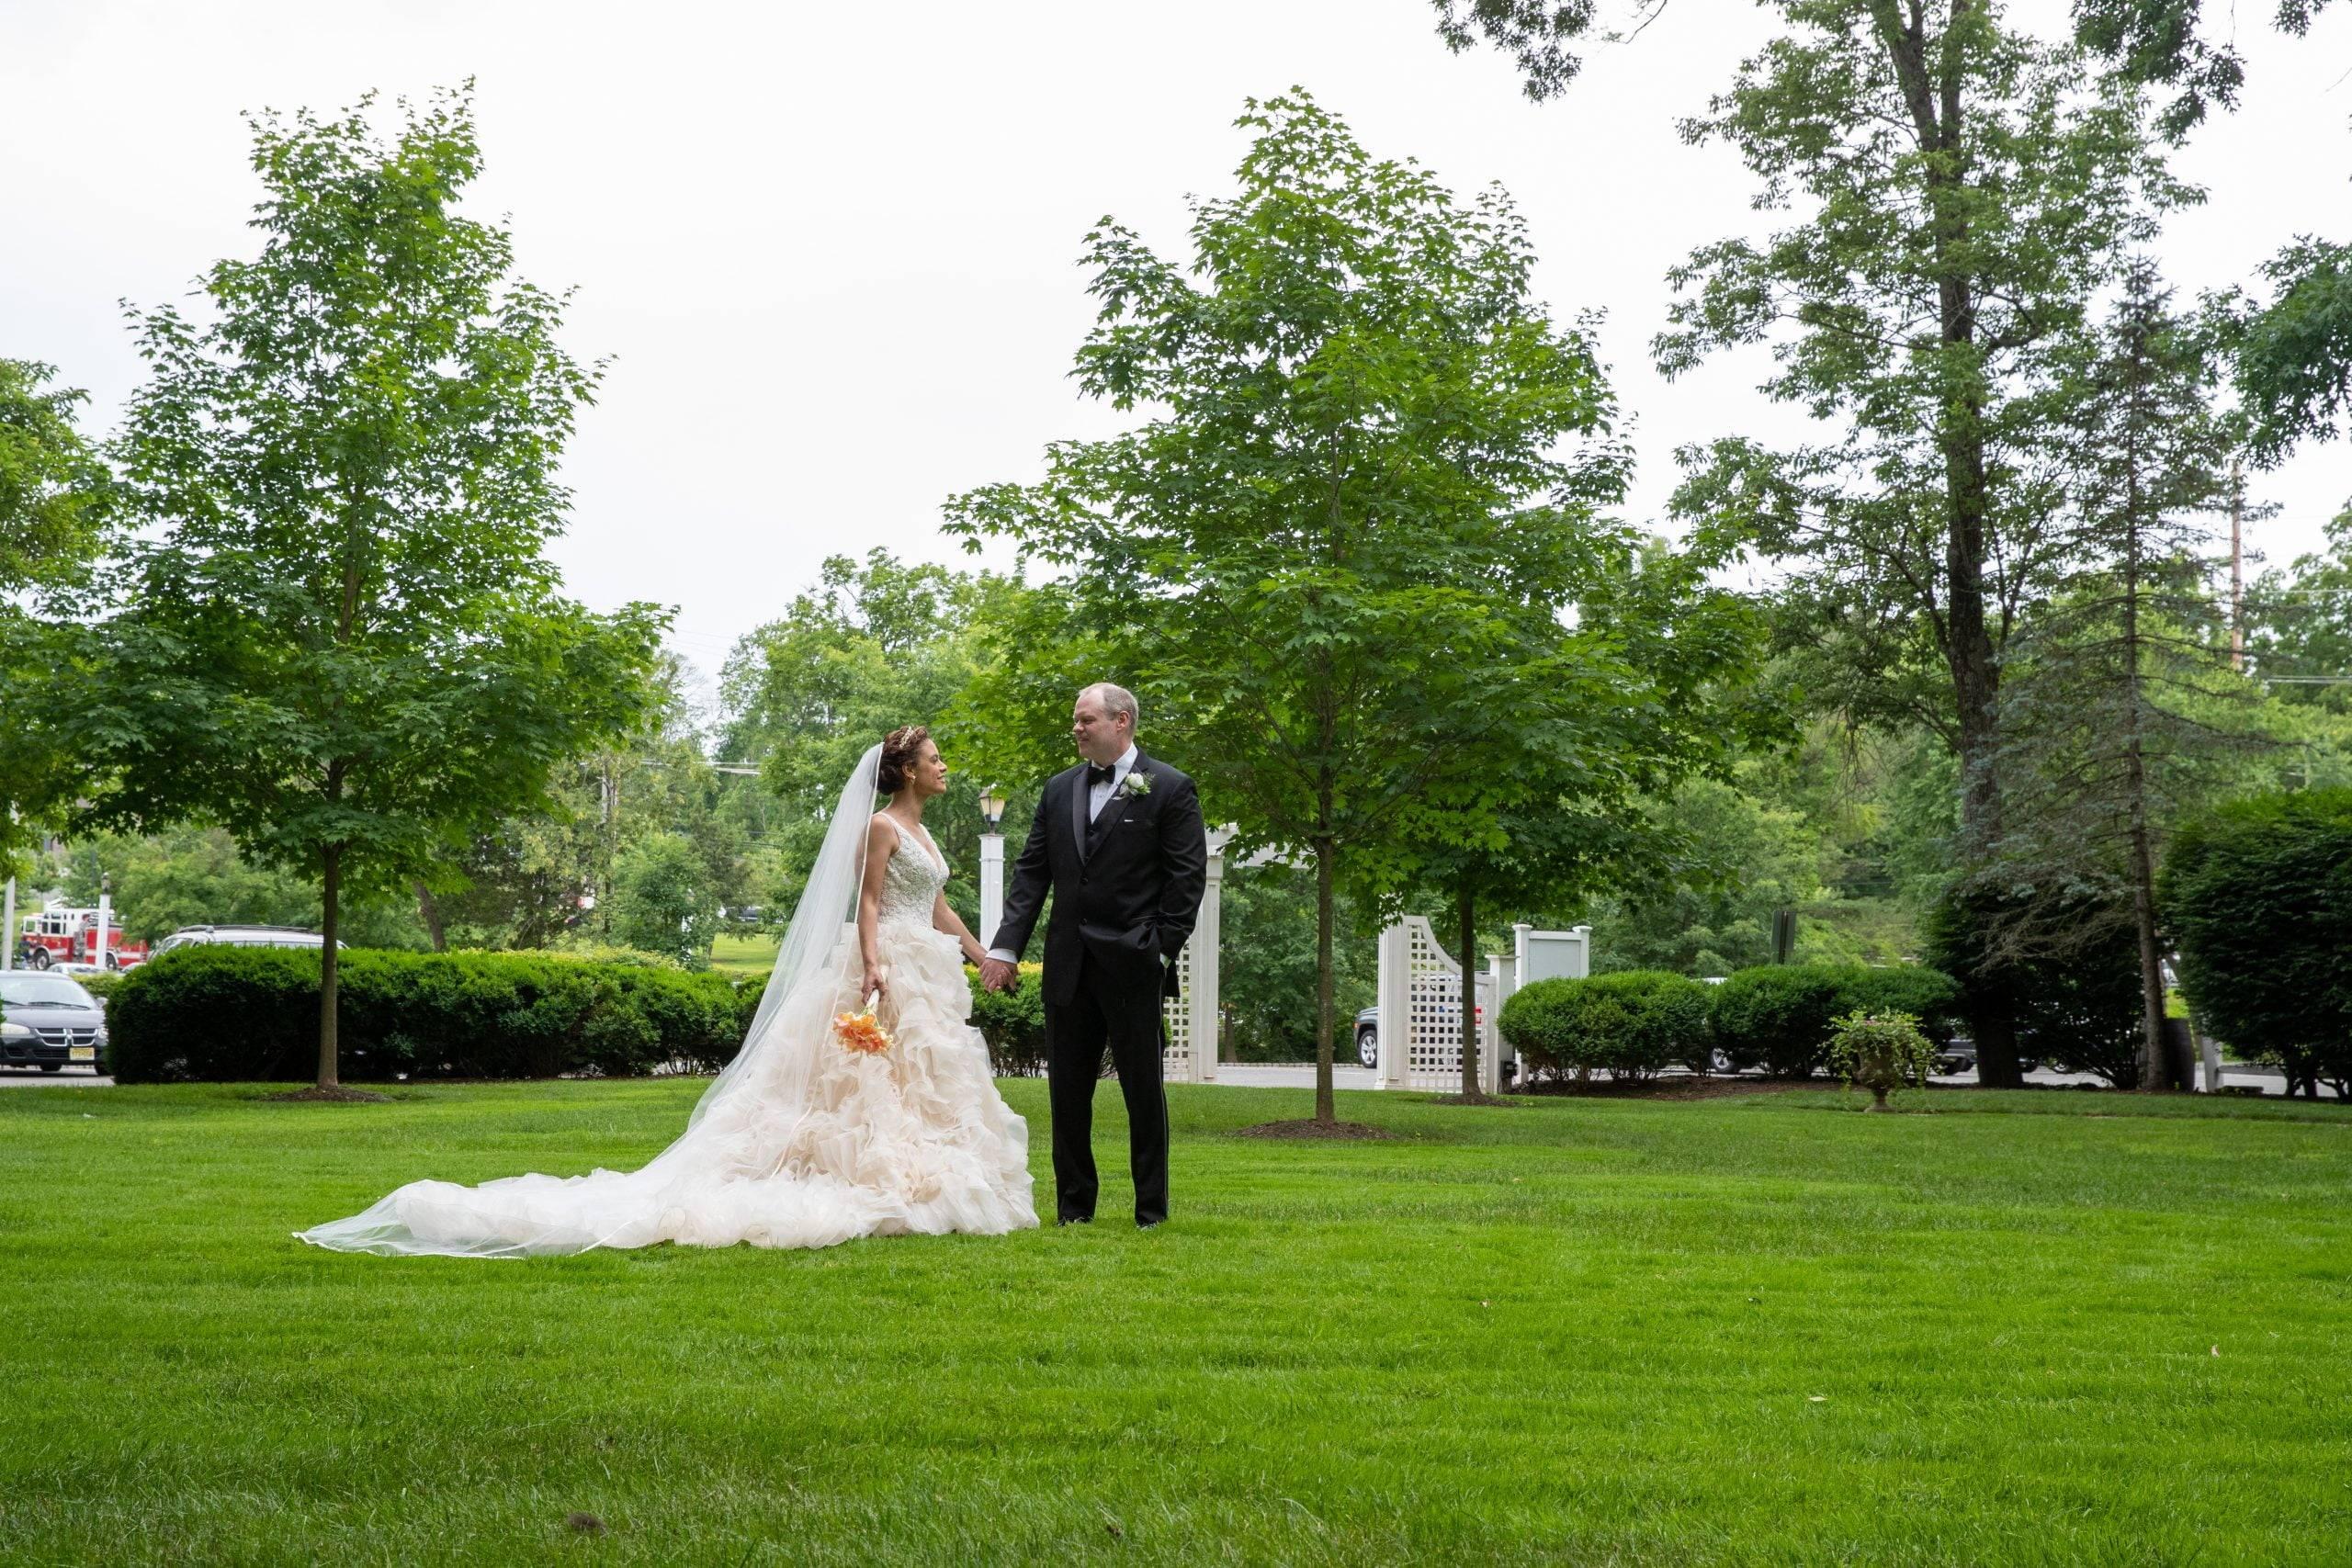 Olde Mill Inn wedding couple on the grass